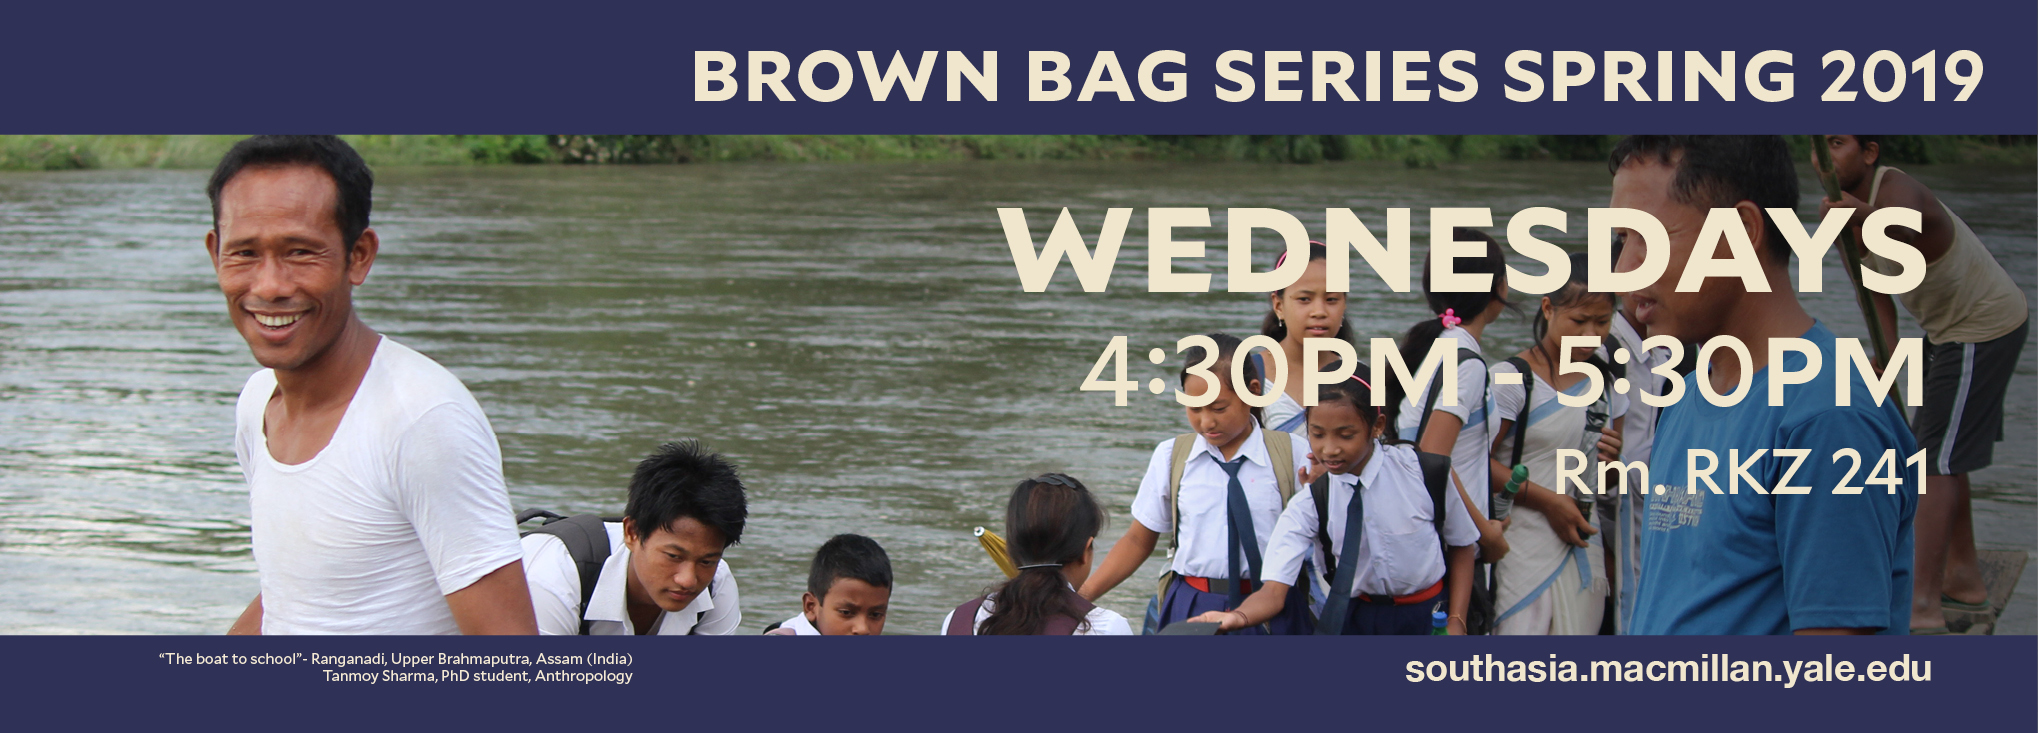 Brown Bag Spring 2019